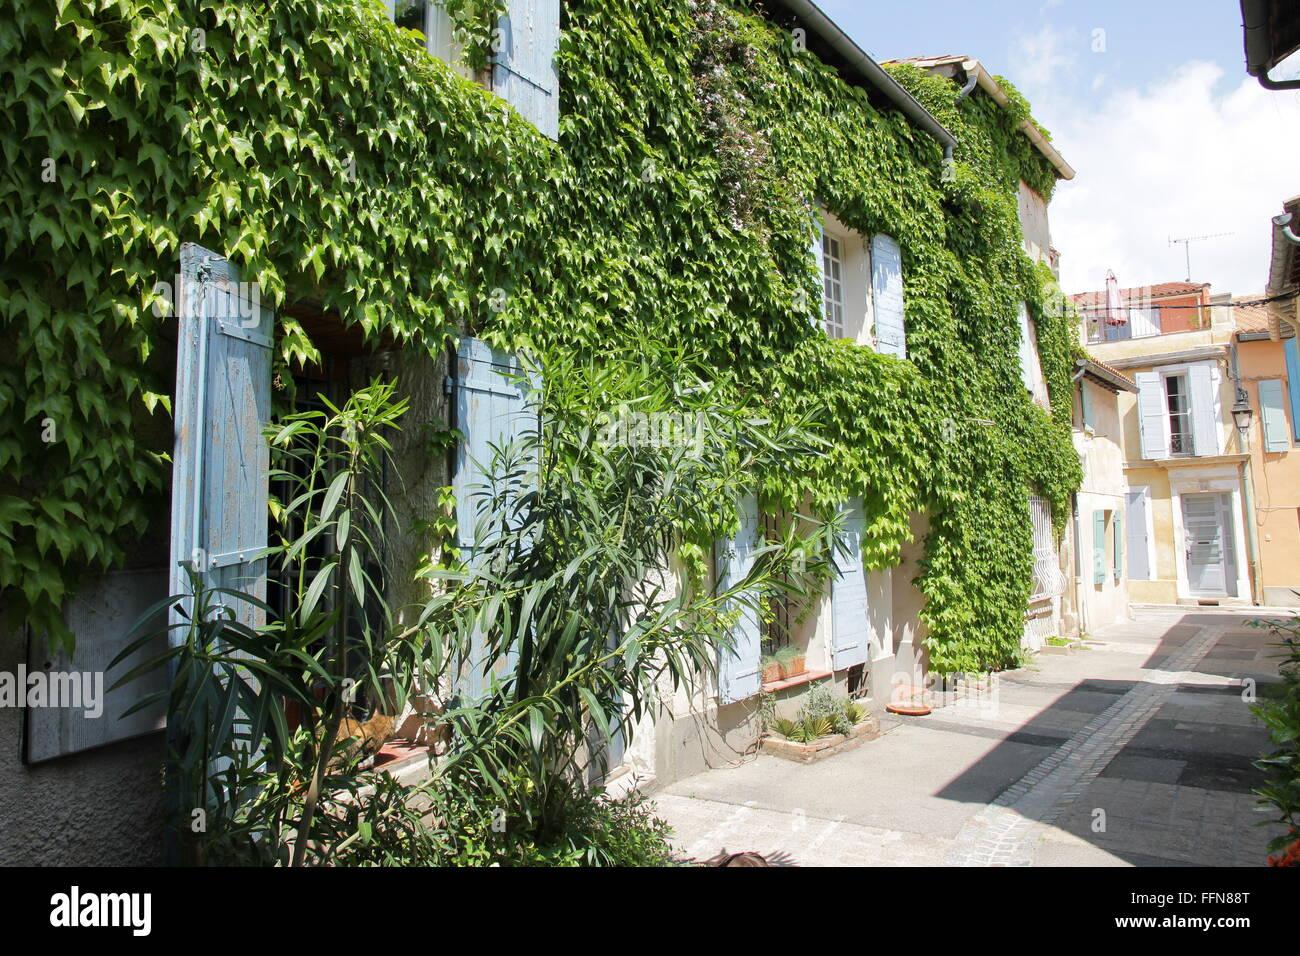 Geographie/reisen, Frankreich, Arles, Gasse in der Altstadt, Additional-Rights - Clearance-Info - Not-Available Stockbild